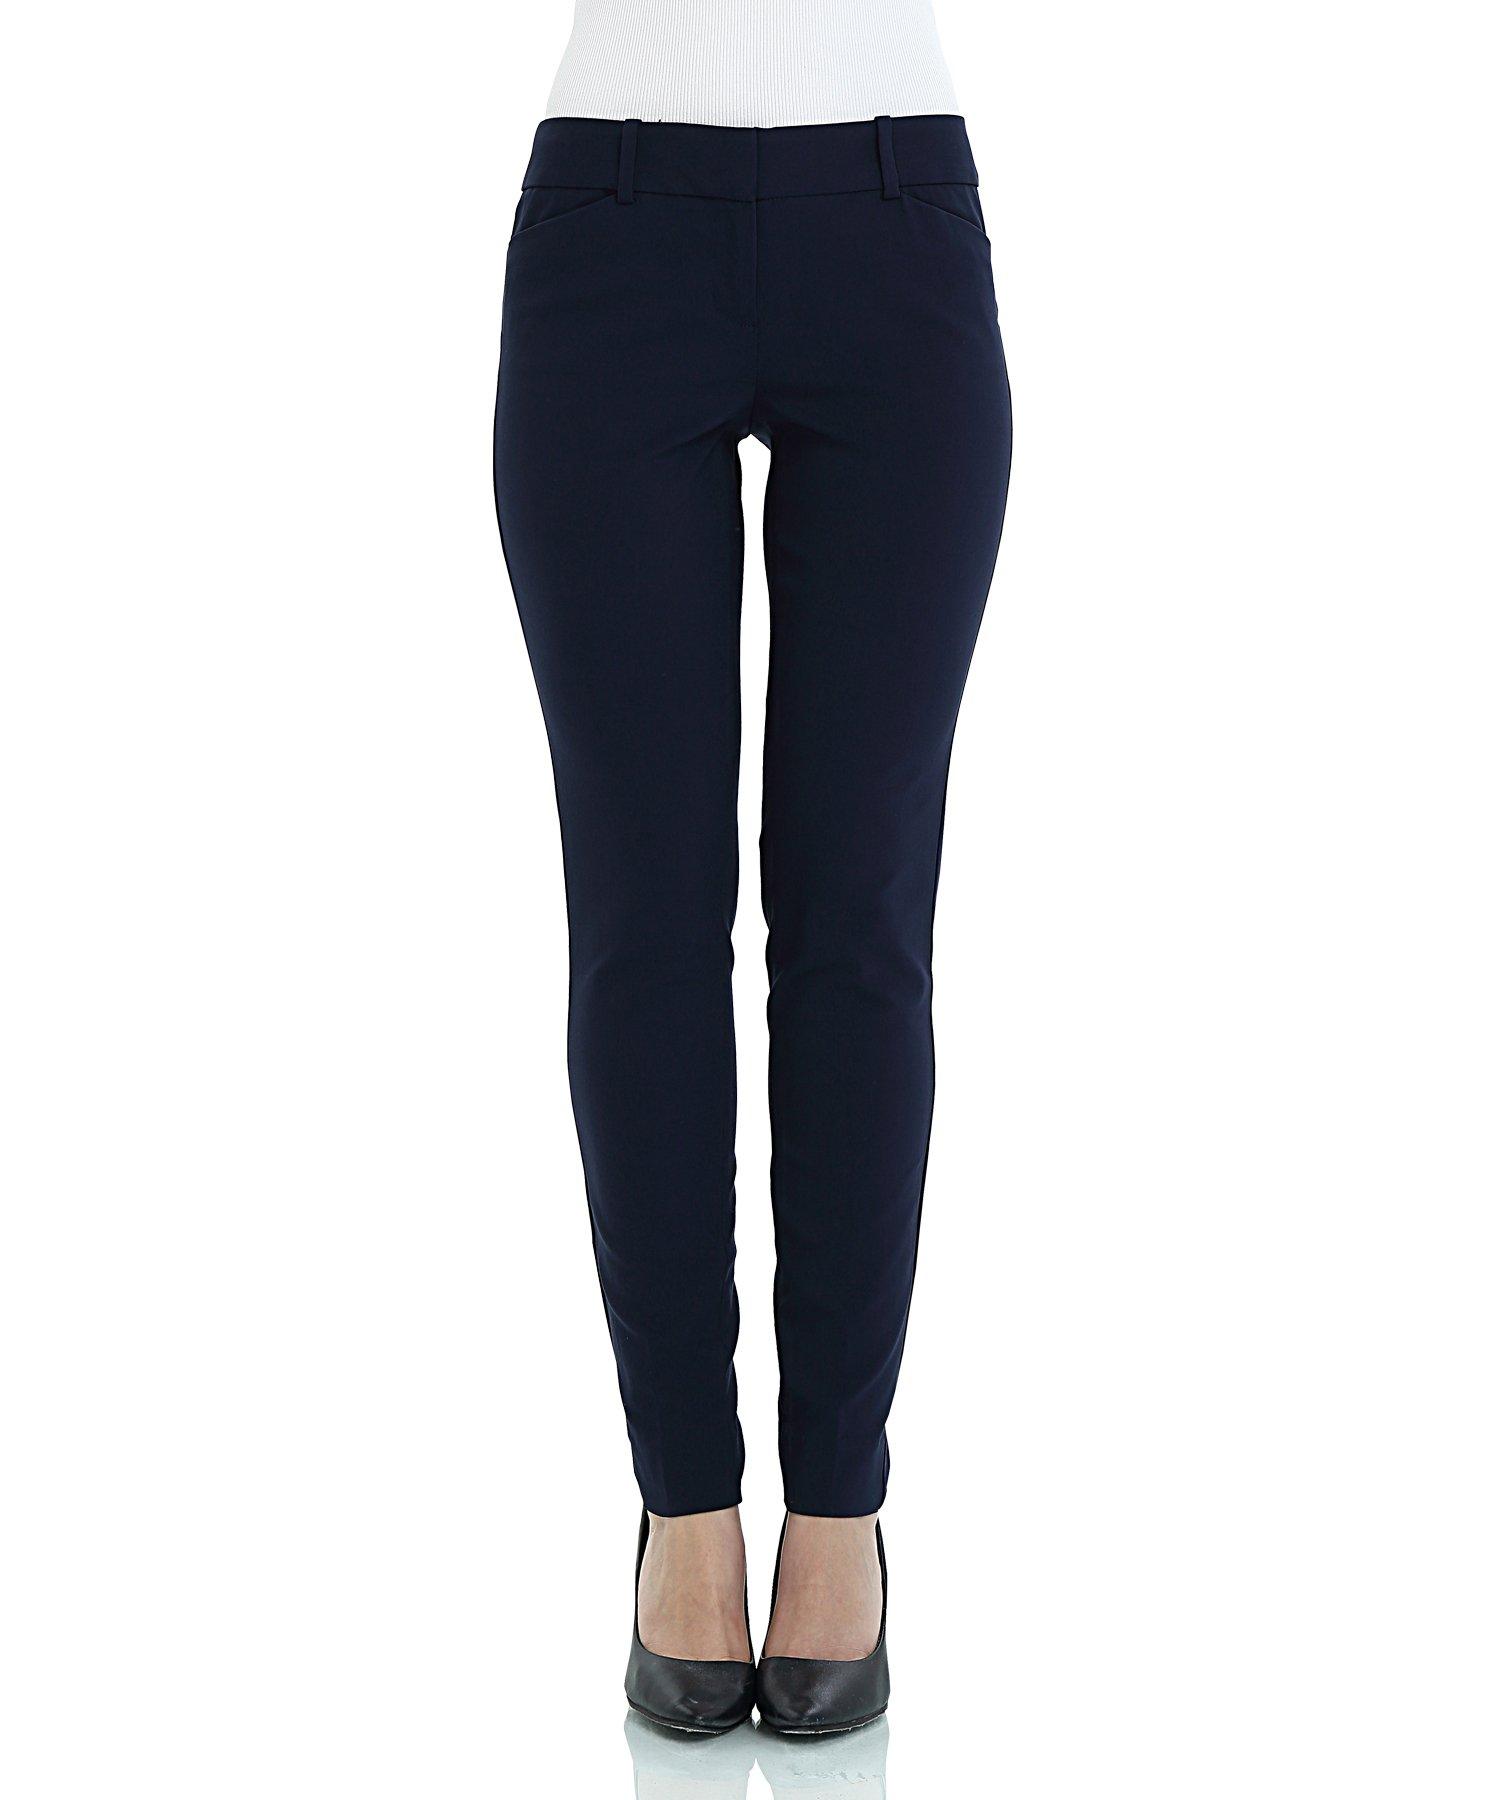 SATINATO Women's Stretch Pants Slim Fit Trousers Navy Blue